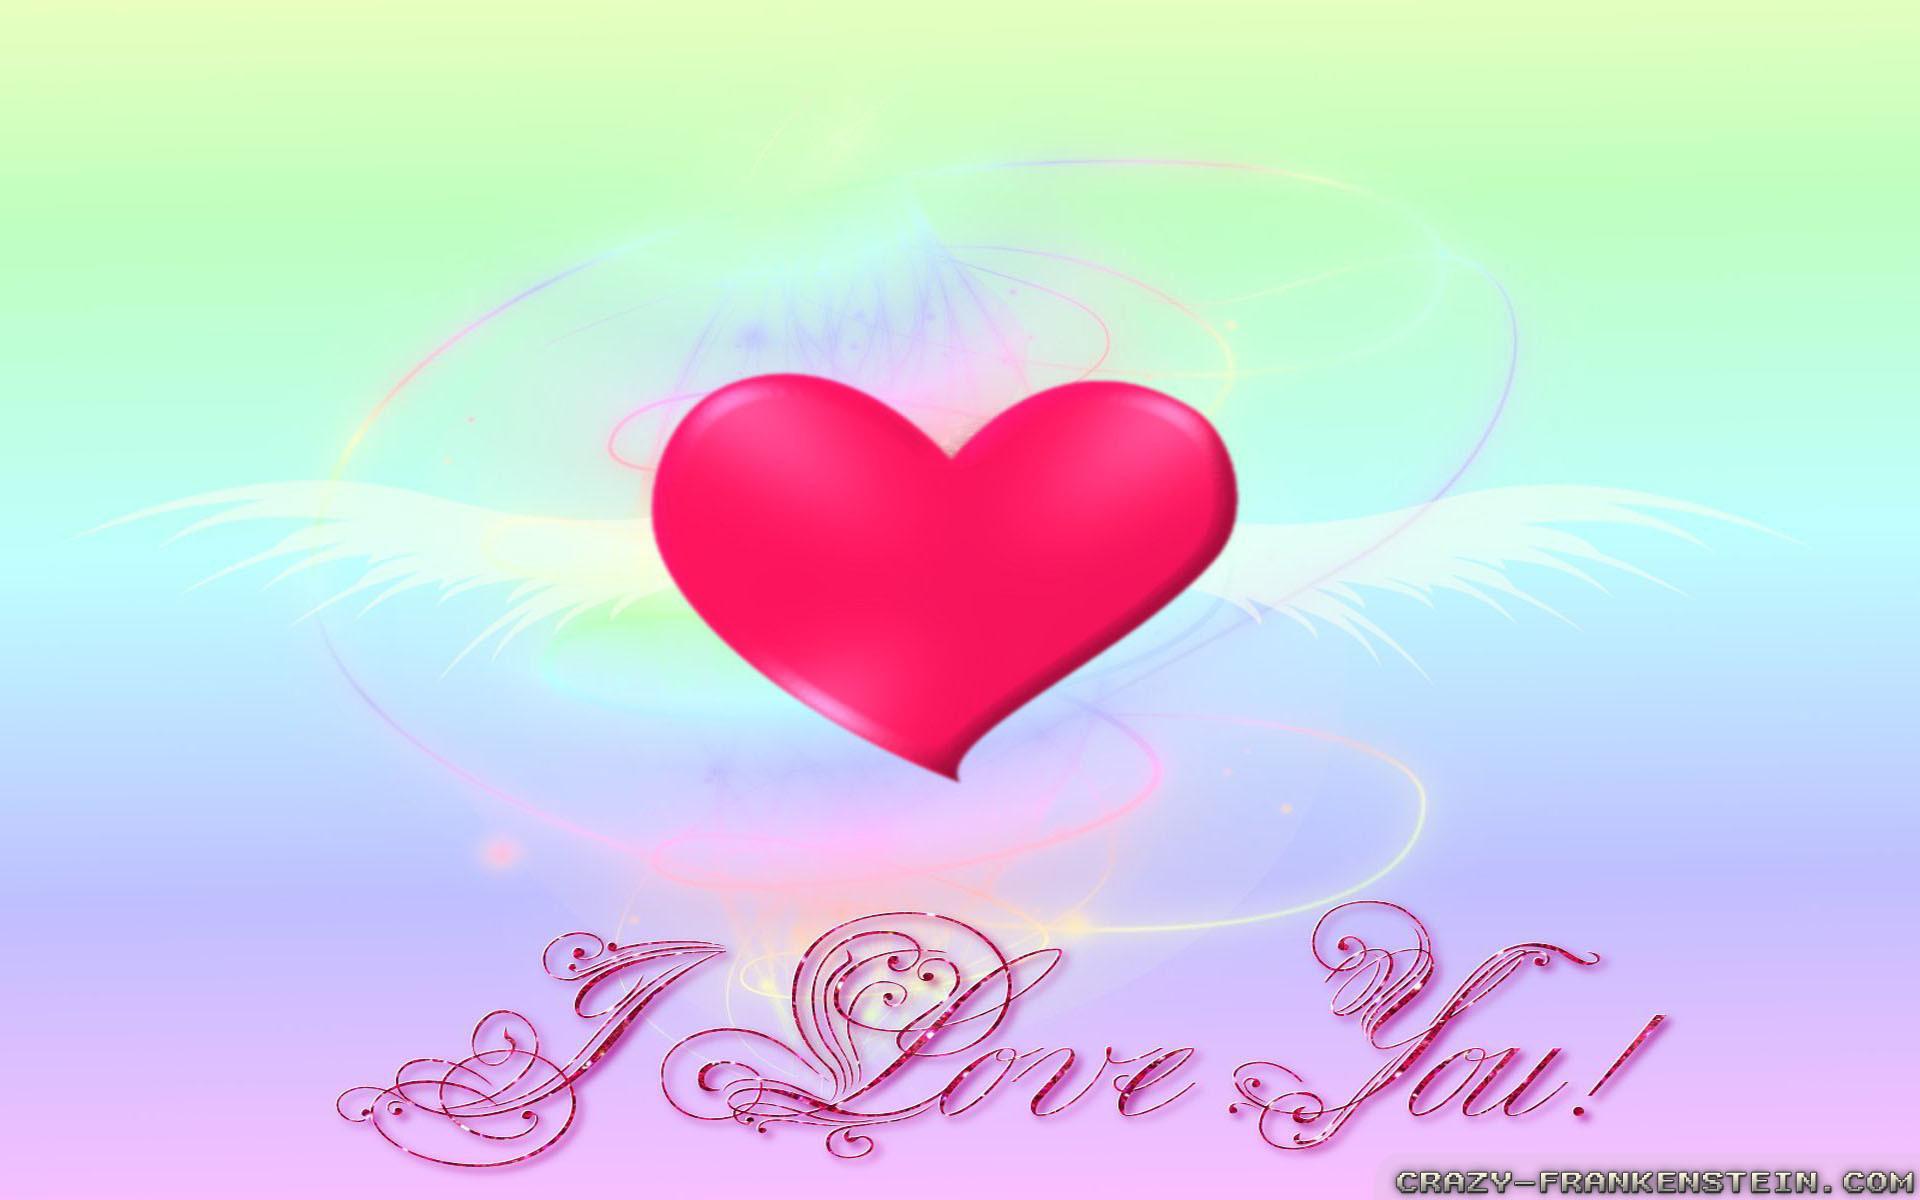 Hd 3d Wallpaper Mobile9 Sweet Love Wallpaper 183 ①